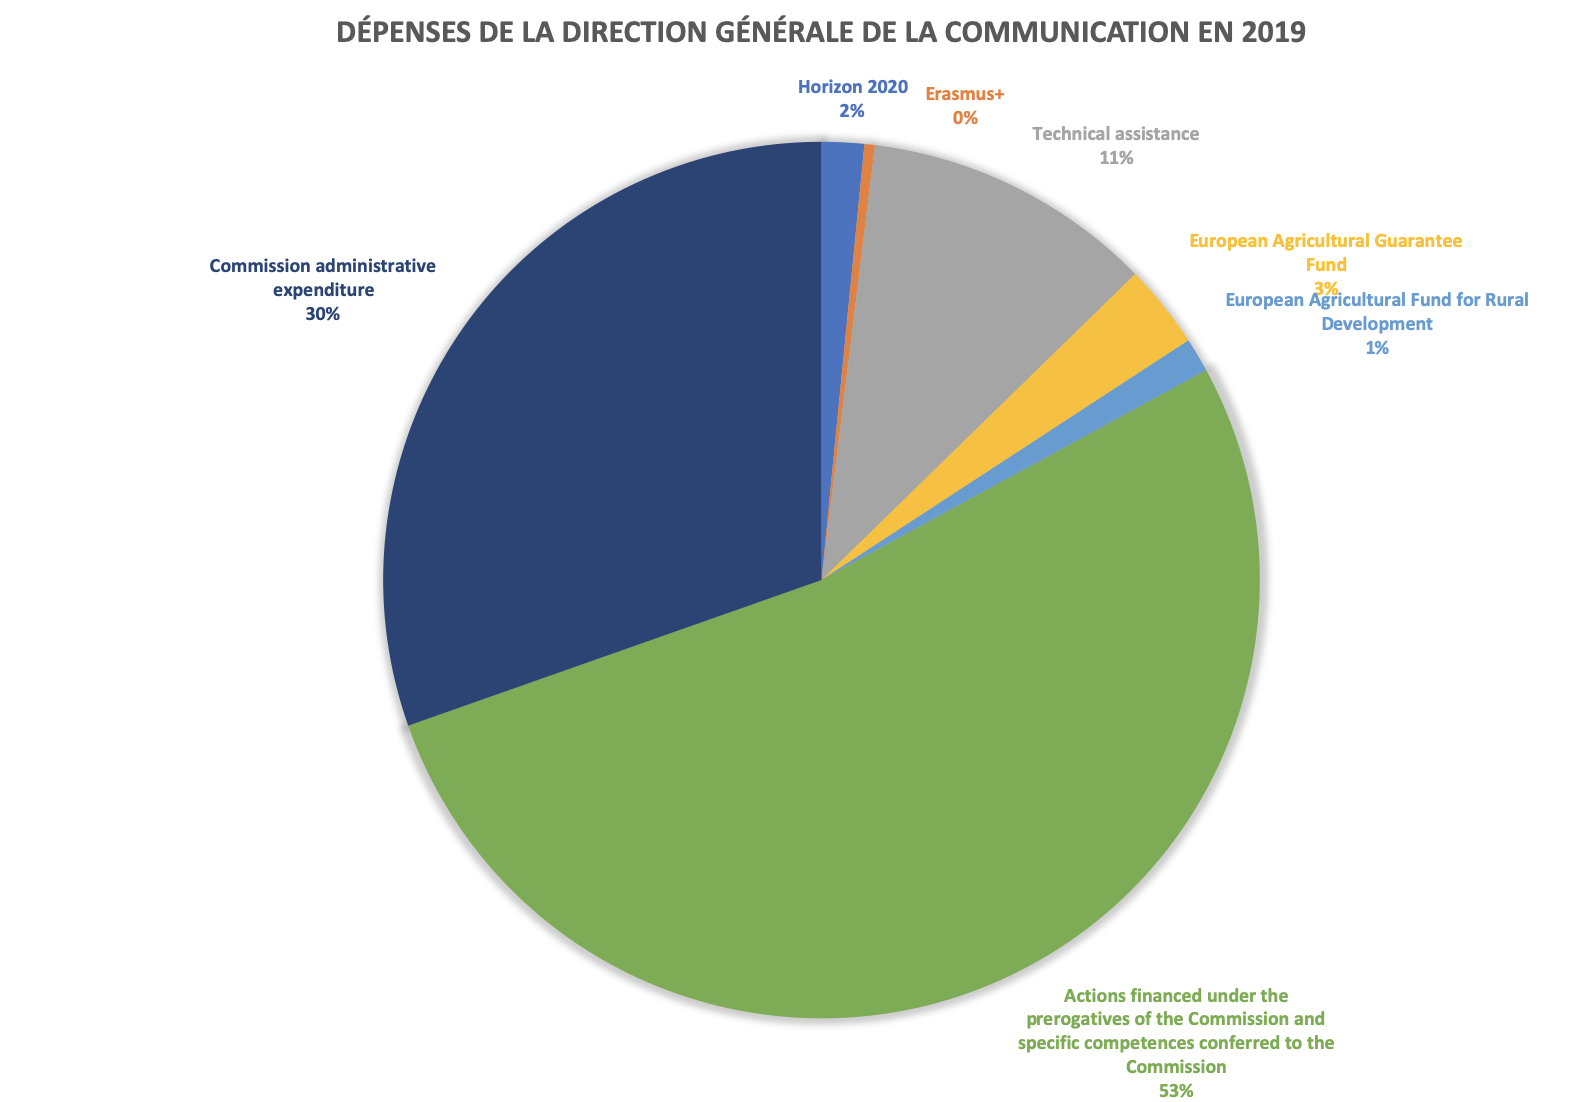 DG_COMM_2019_depenses_generales